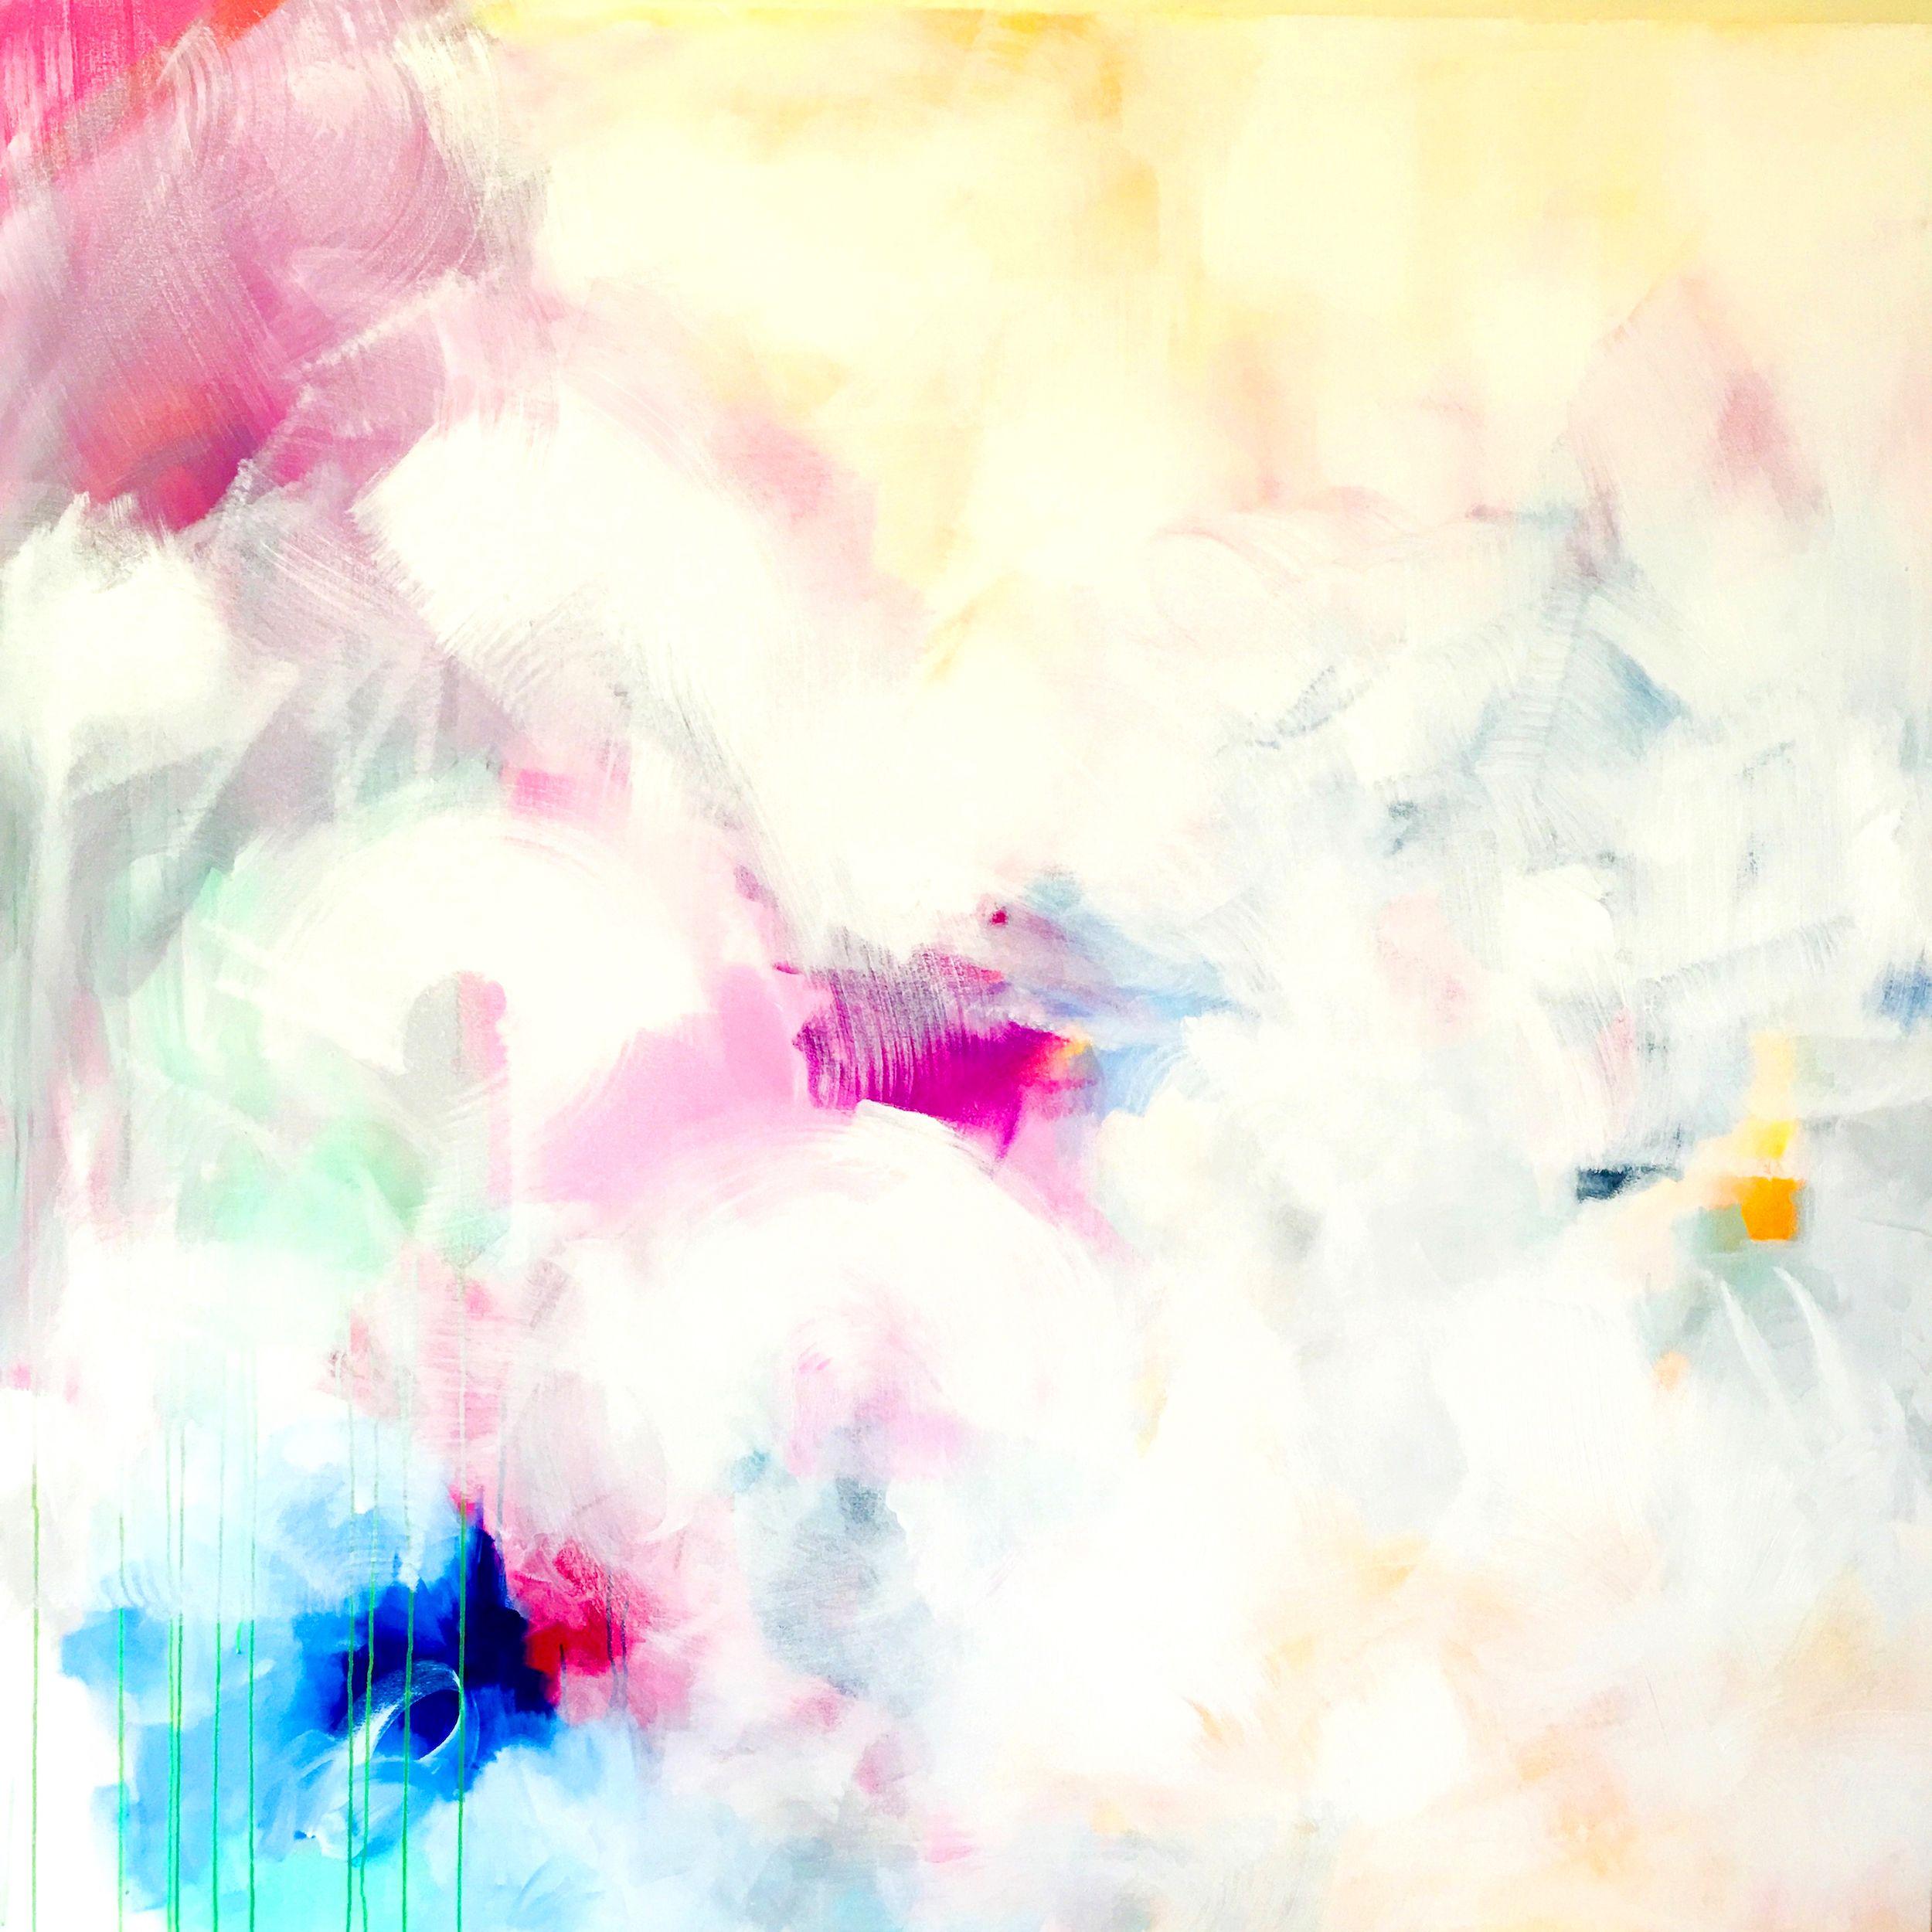 Do It Over, Sana Jamlaney, Acrylic, and Spray Paint on Canvas, 72x72 in, 2016